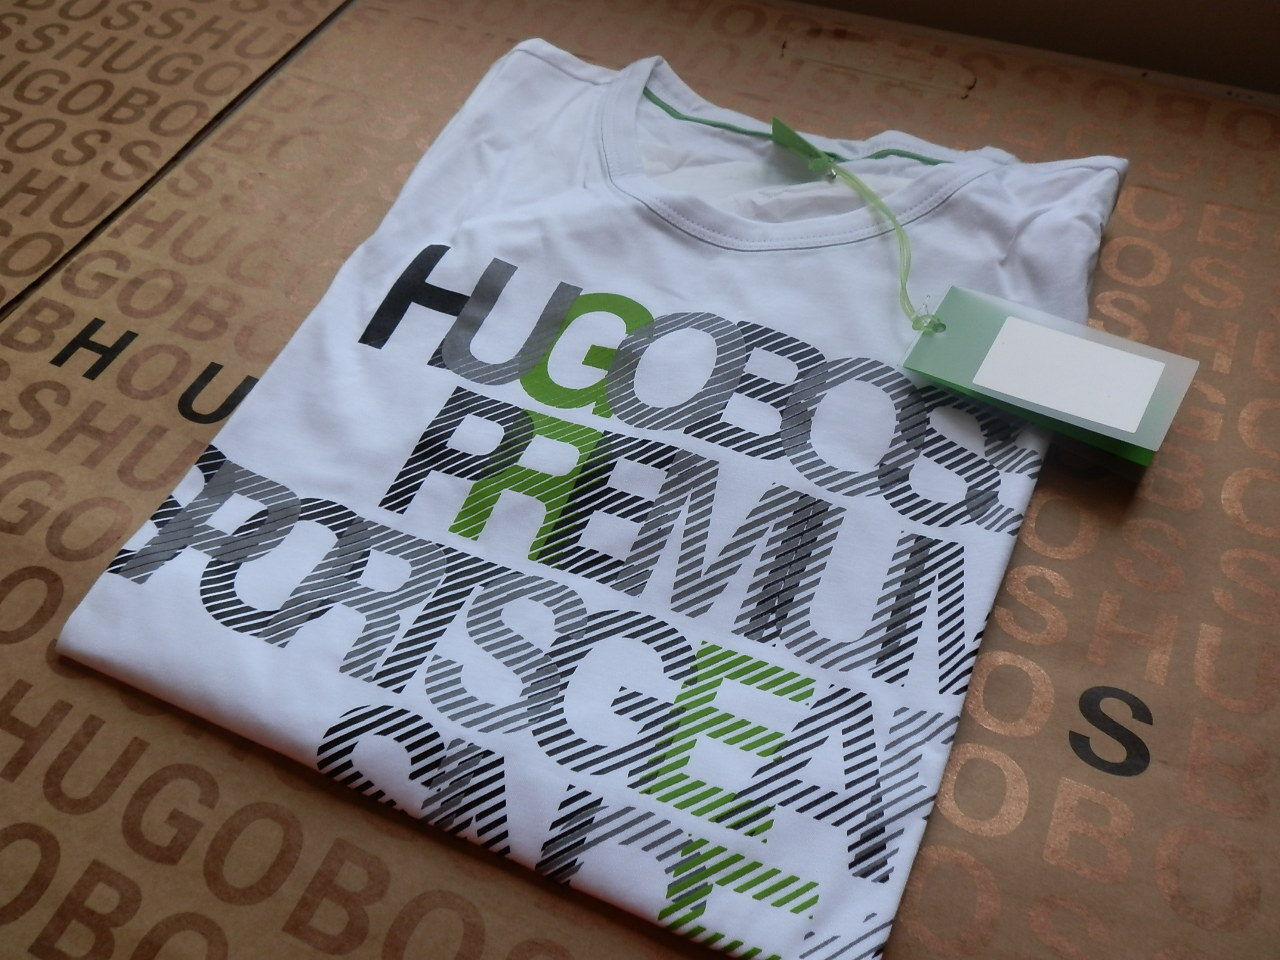 NEW HUGO BOSS MENS WHITE DESIGNER PREMIUM SPORTS GEAR JEANS SUIT BAG T-SHIRT M L